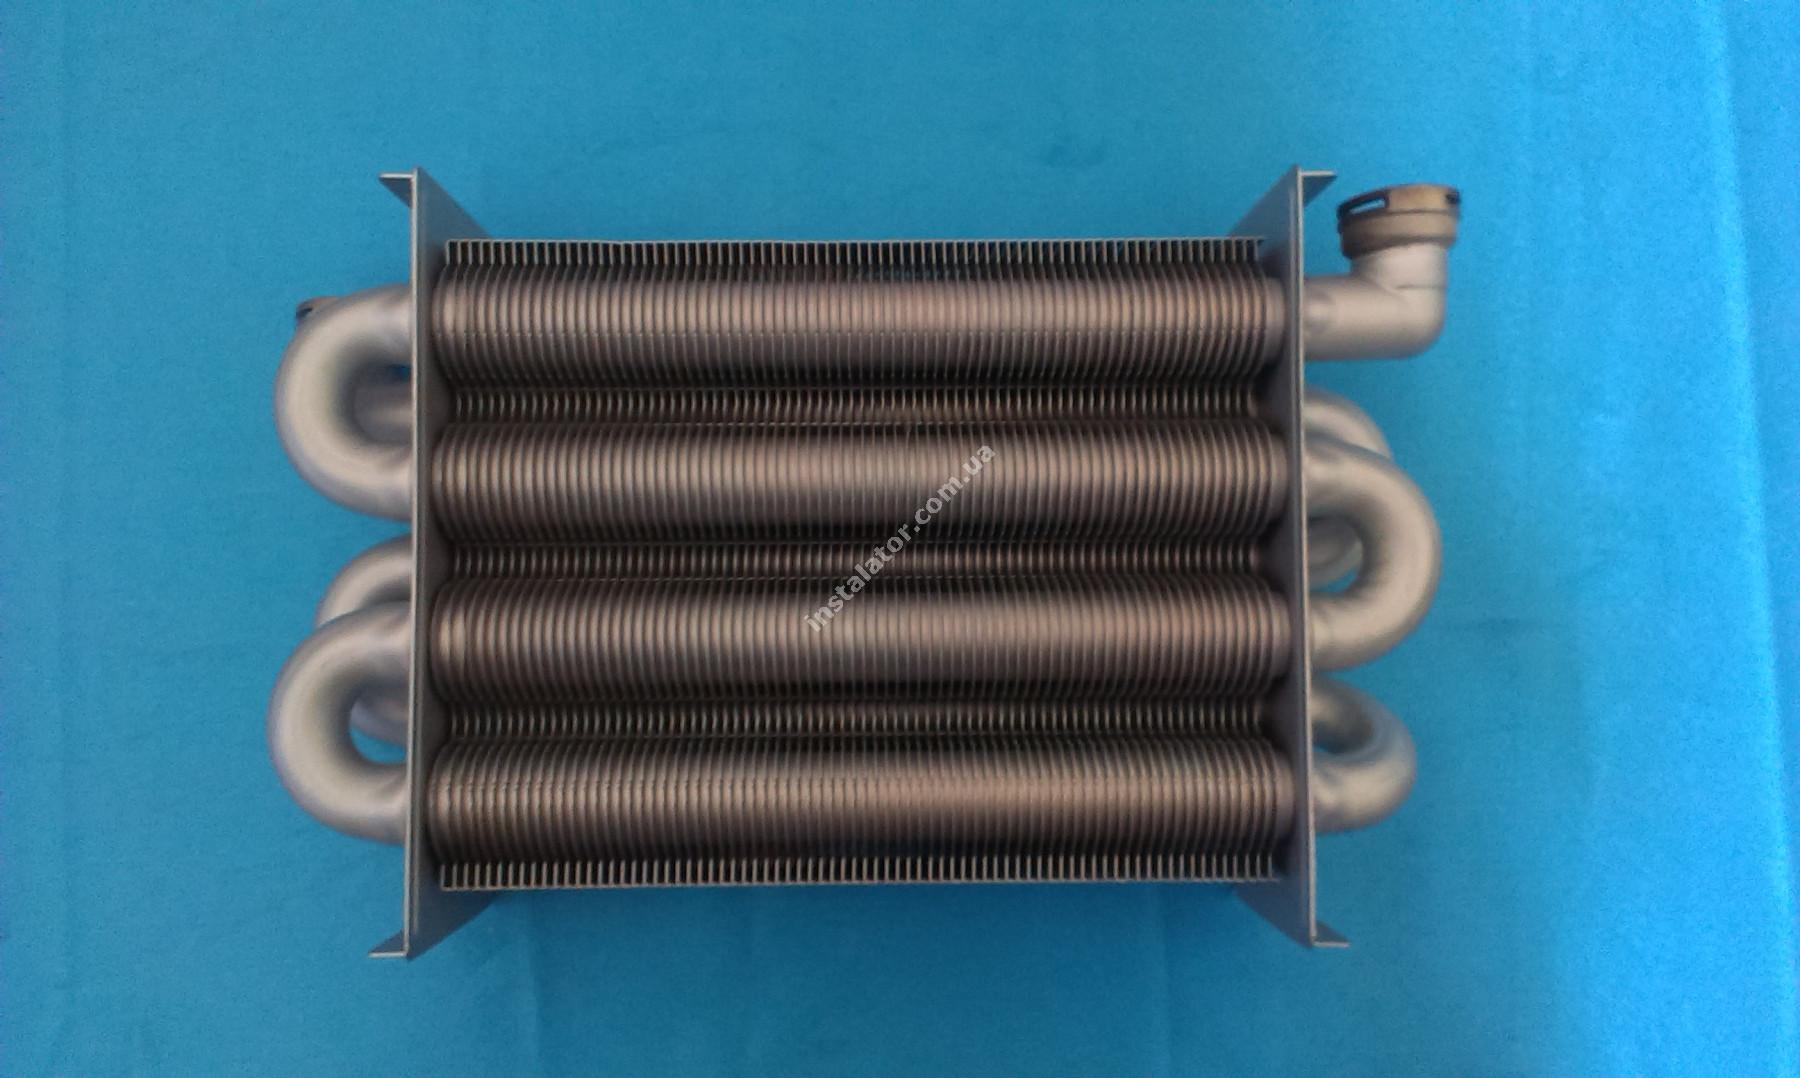 65100425 Теплообмінник первинний ARISTON Uno (турбо) full-image-3